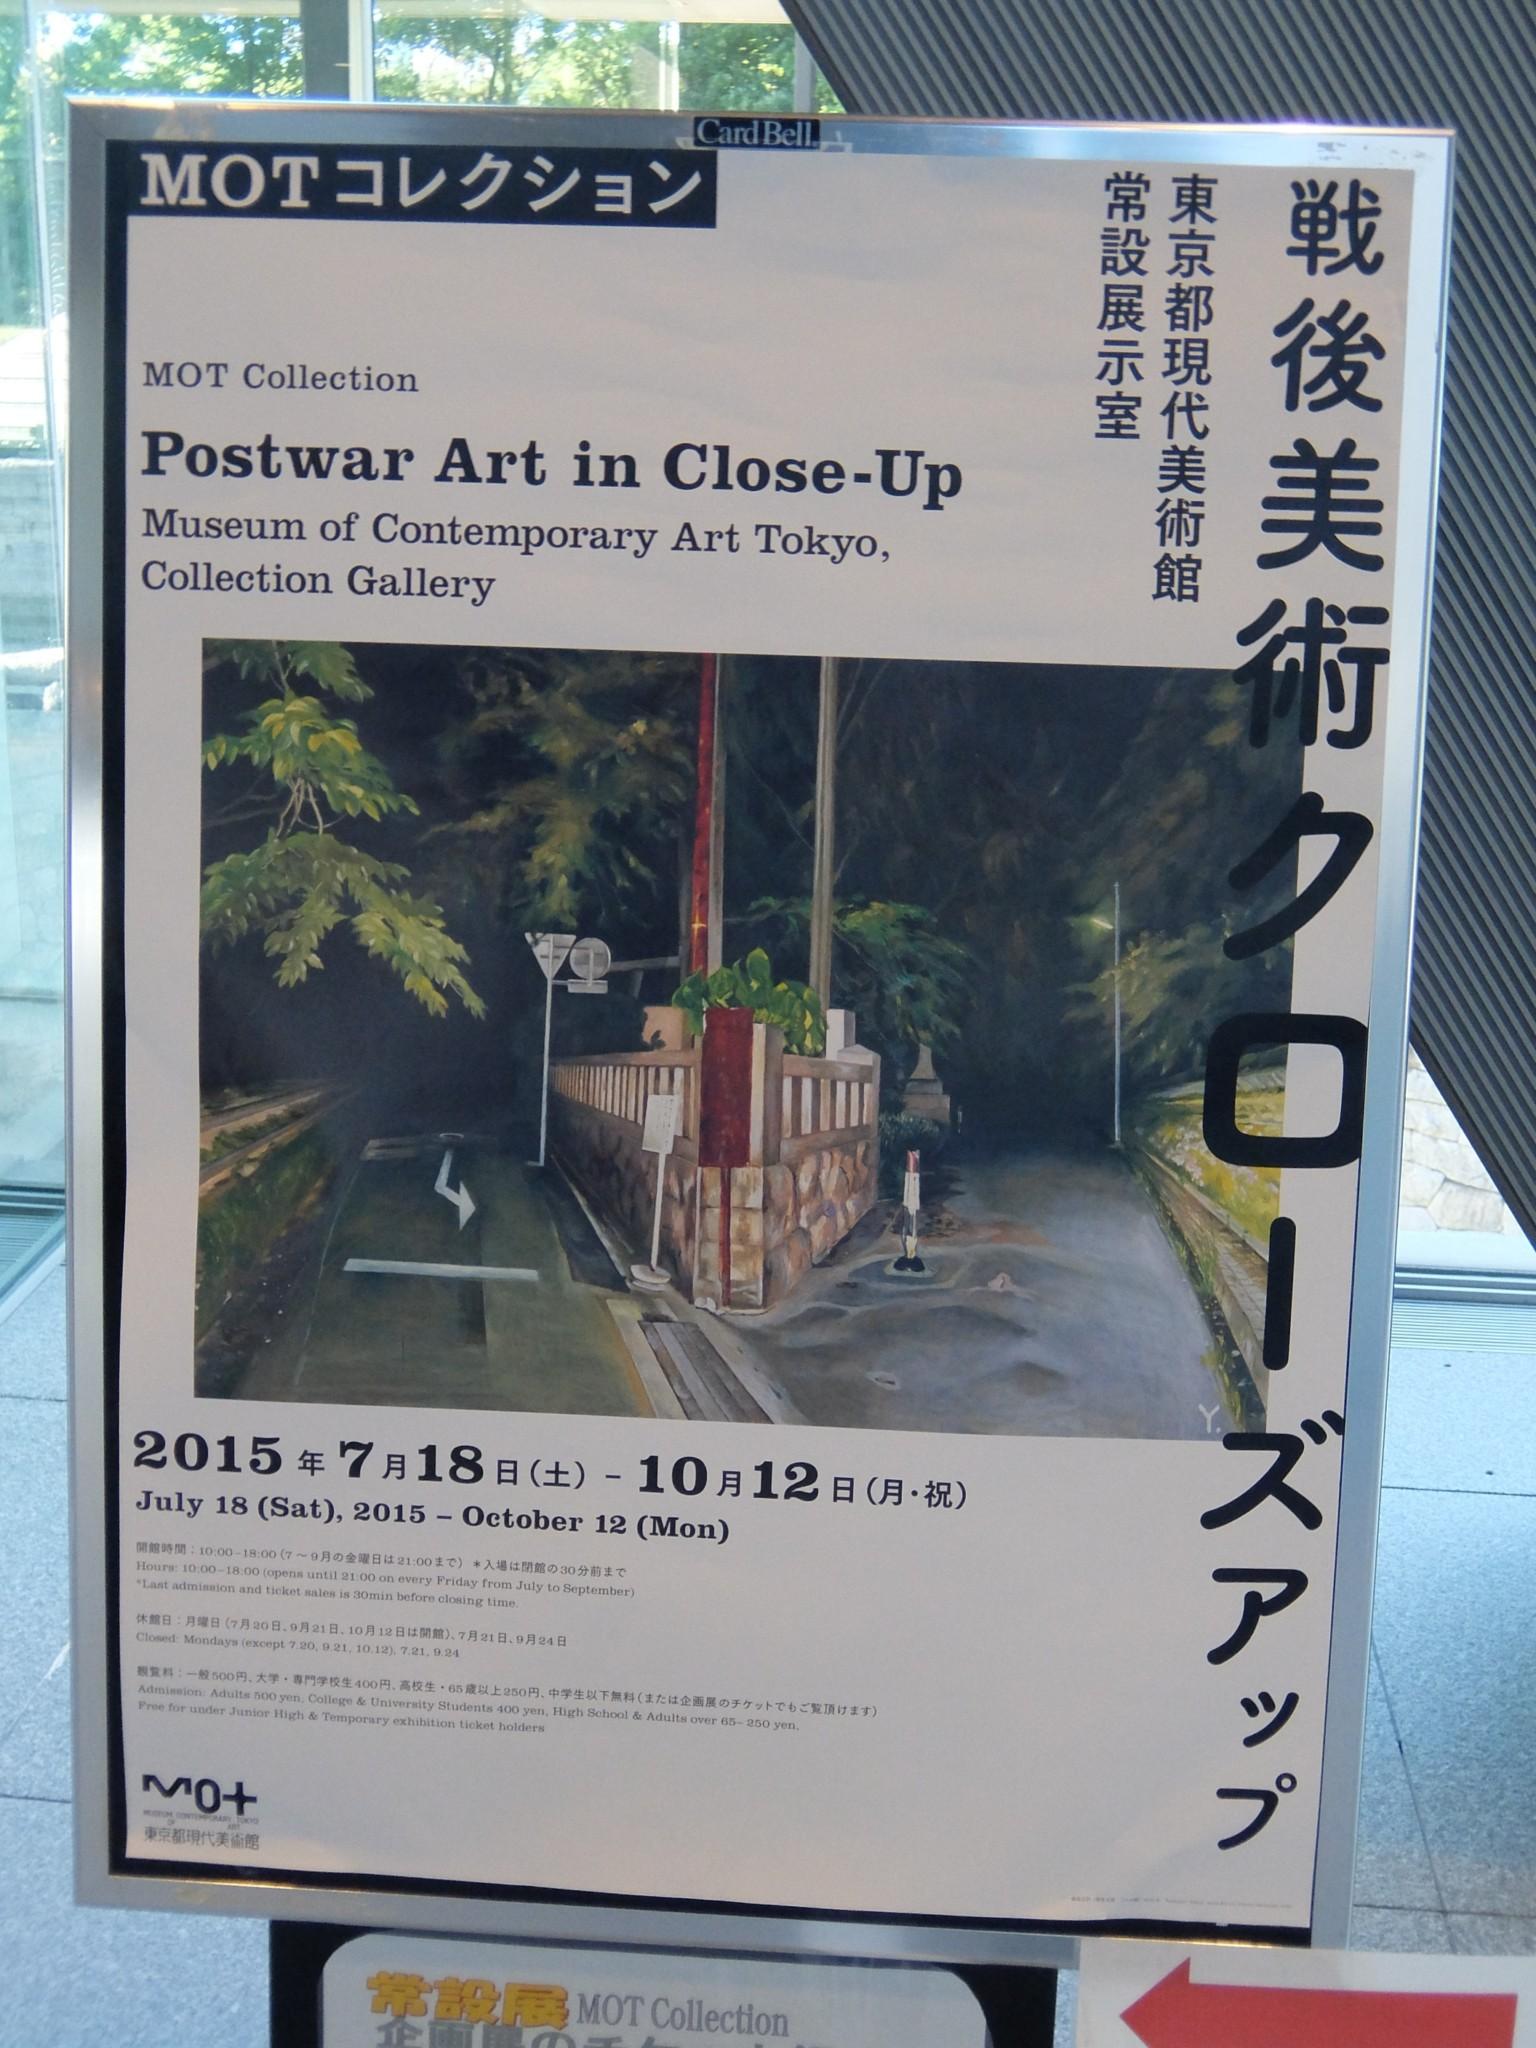 MOTコレクション 戦後美術クローズアップ